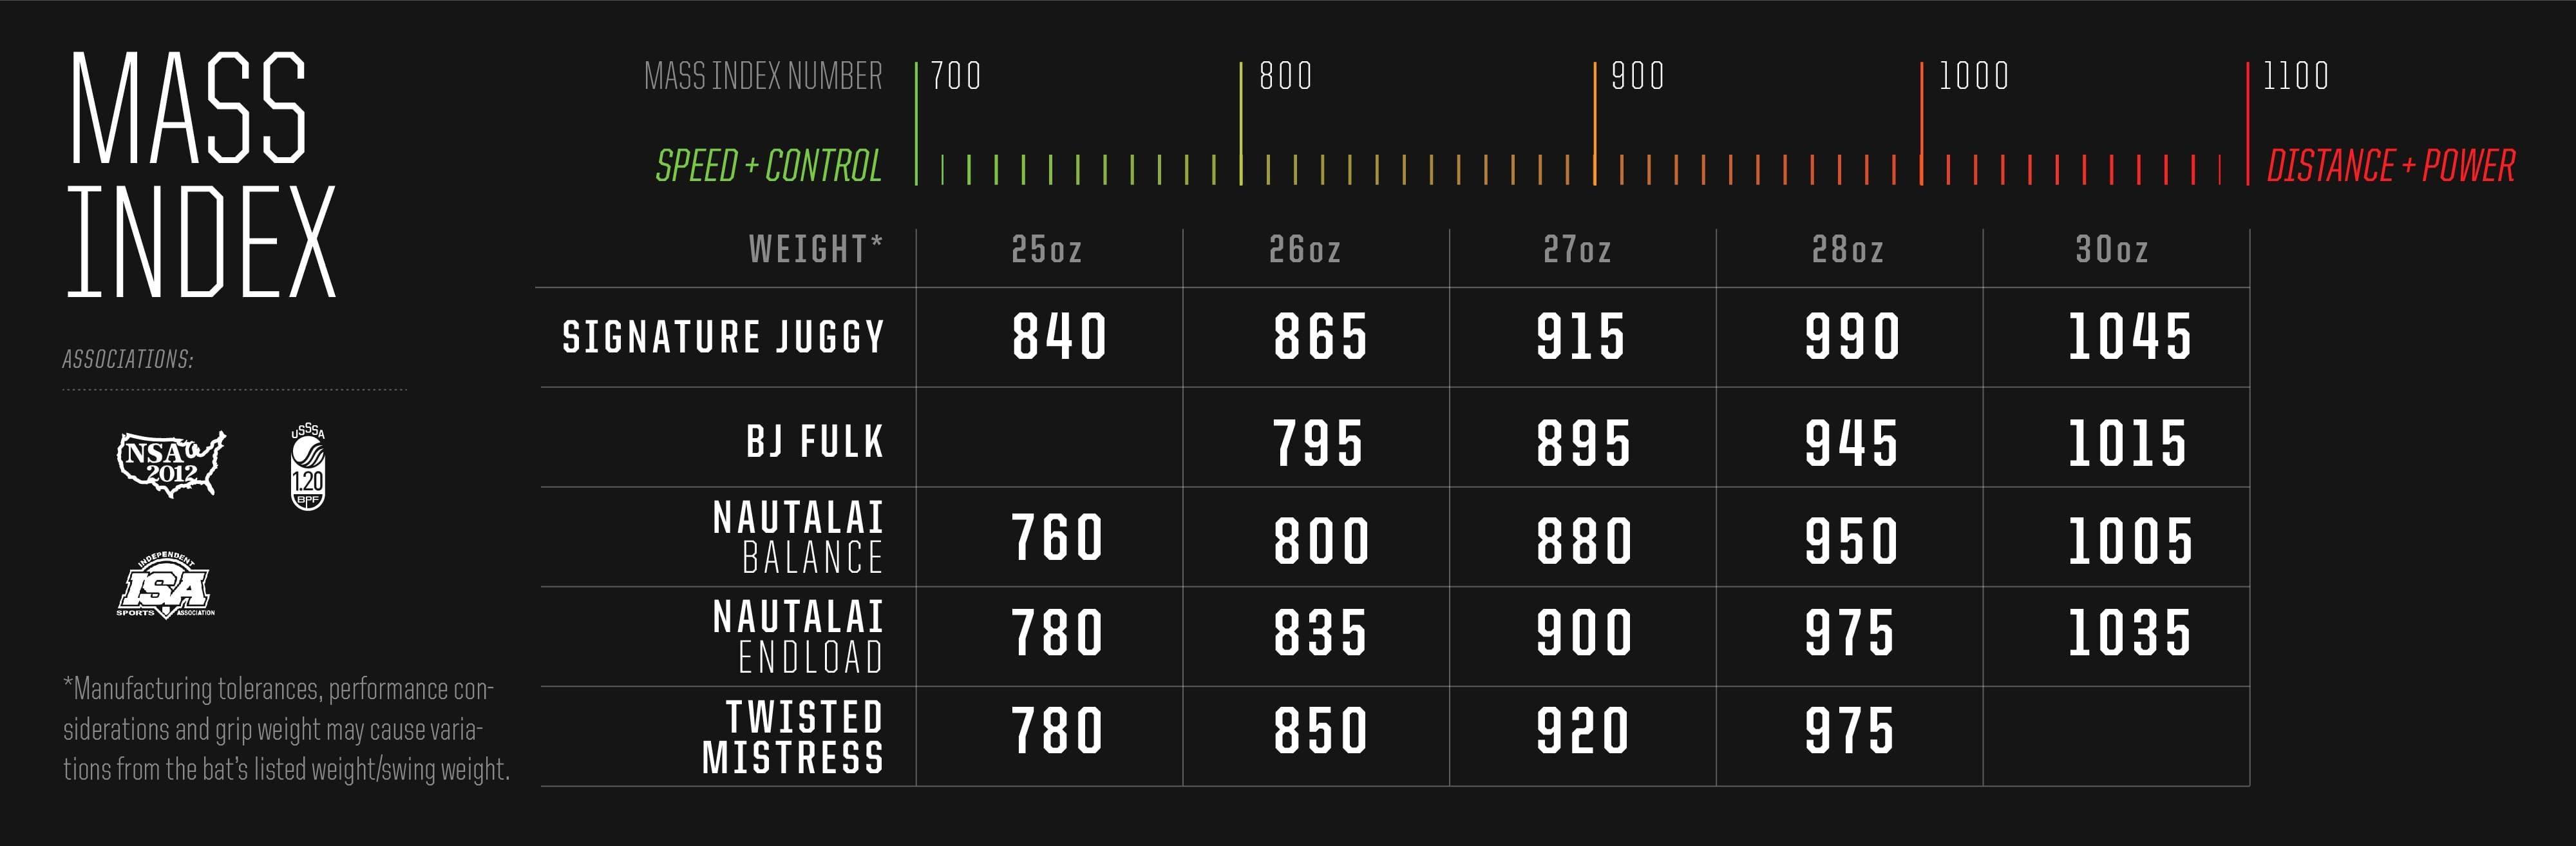 DeMarini Slowpitch bats mass index chart